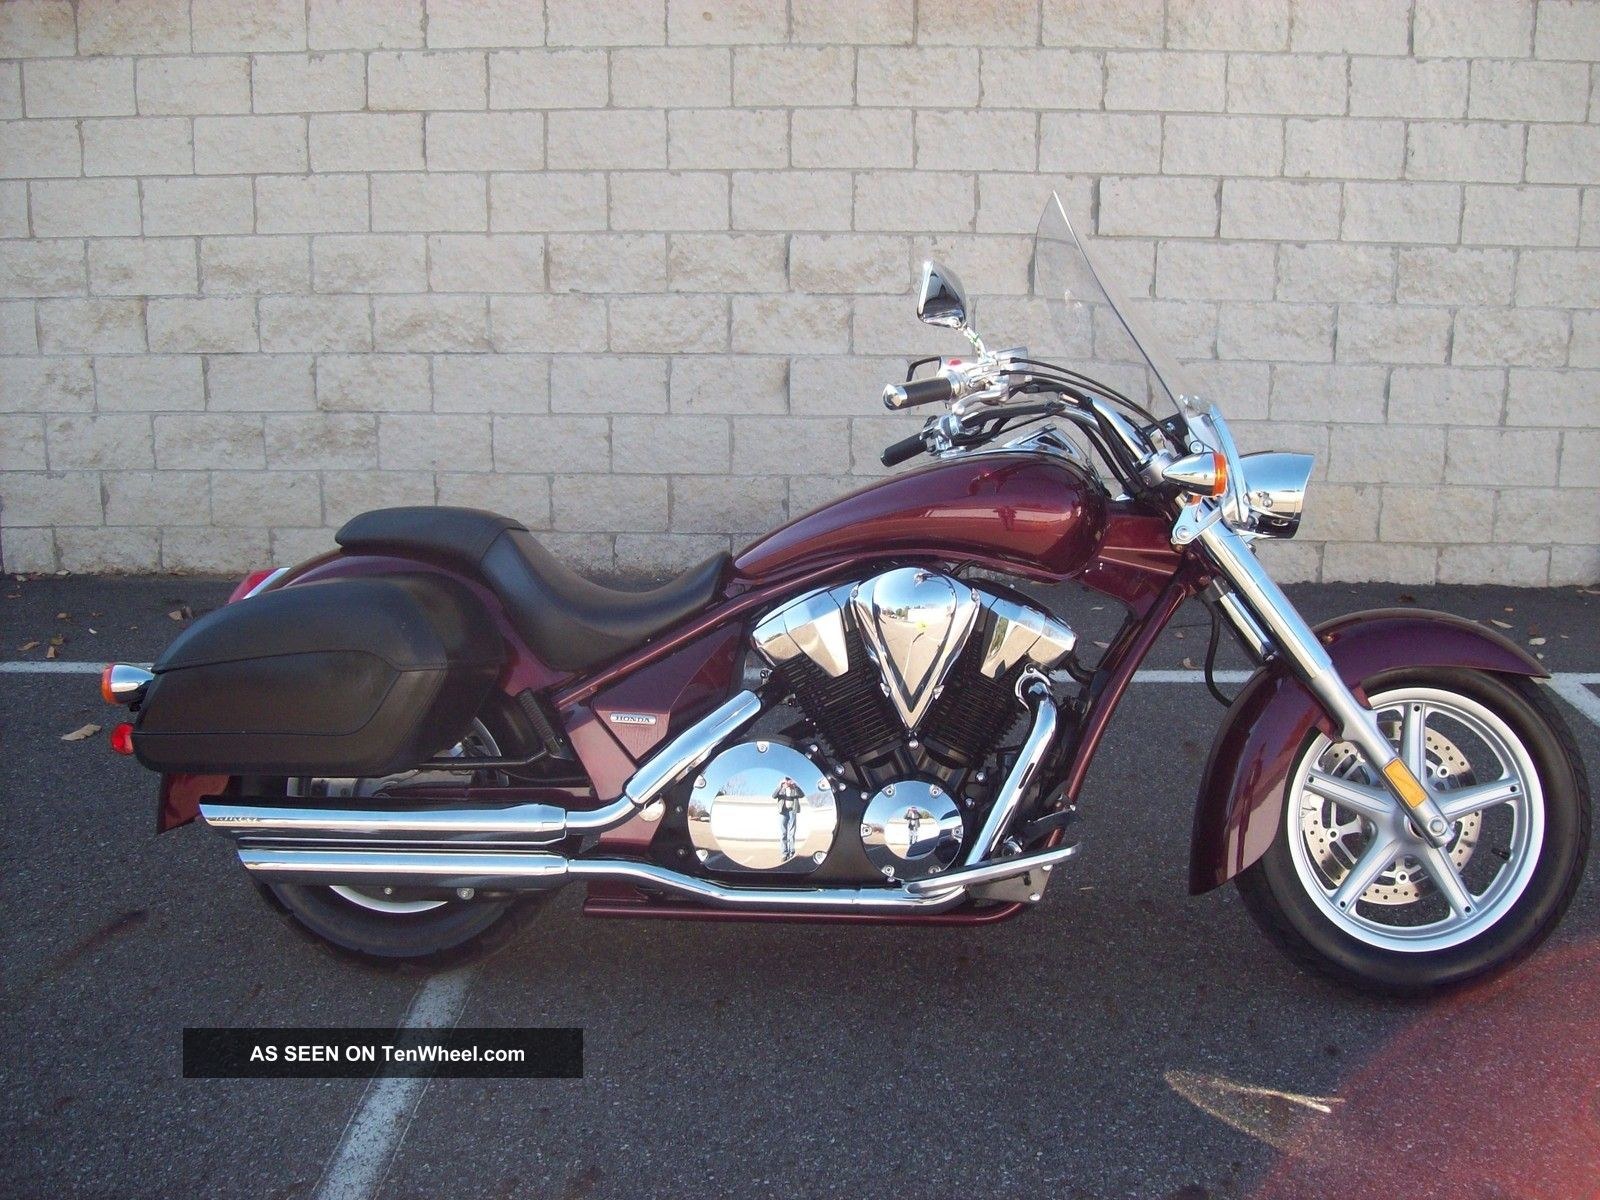 2011 Honda Vt1300ct Shadow Sabre Interstate Um90615 D